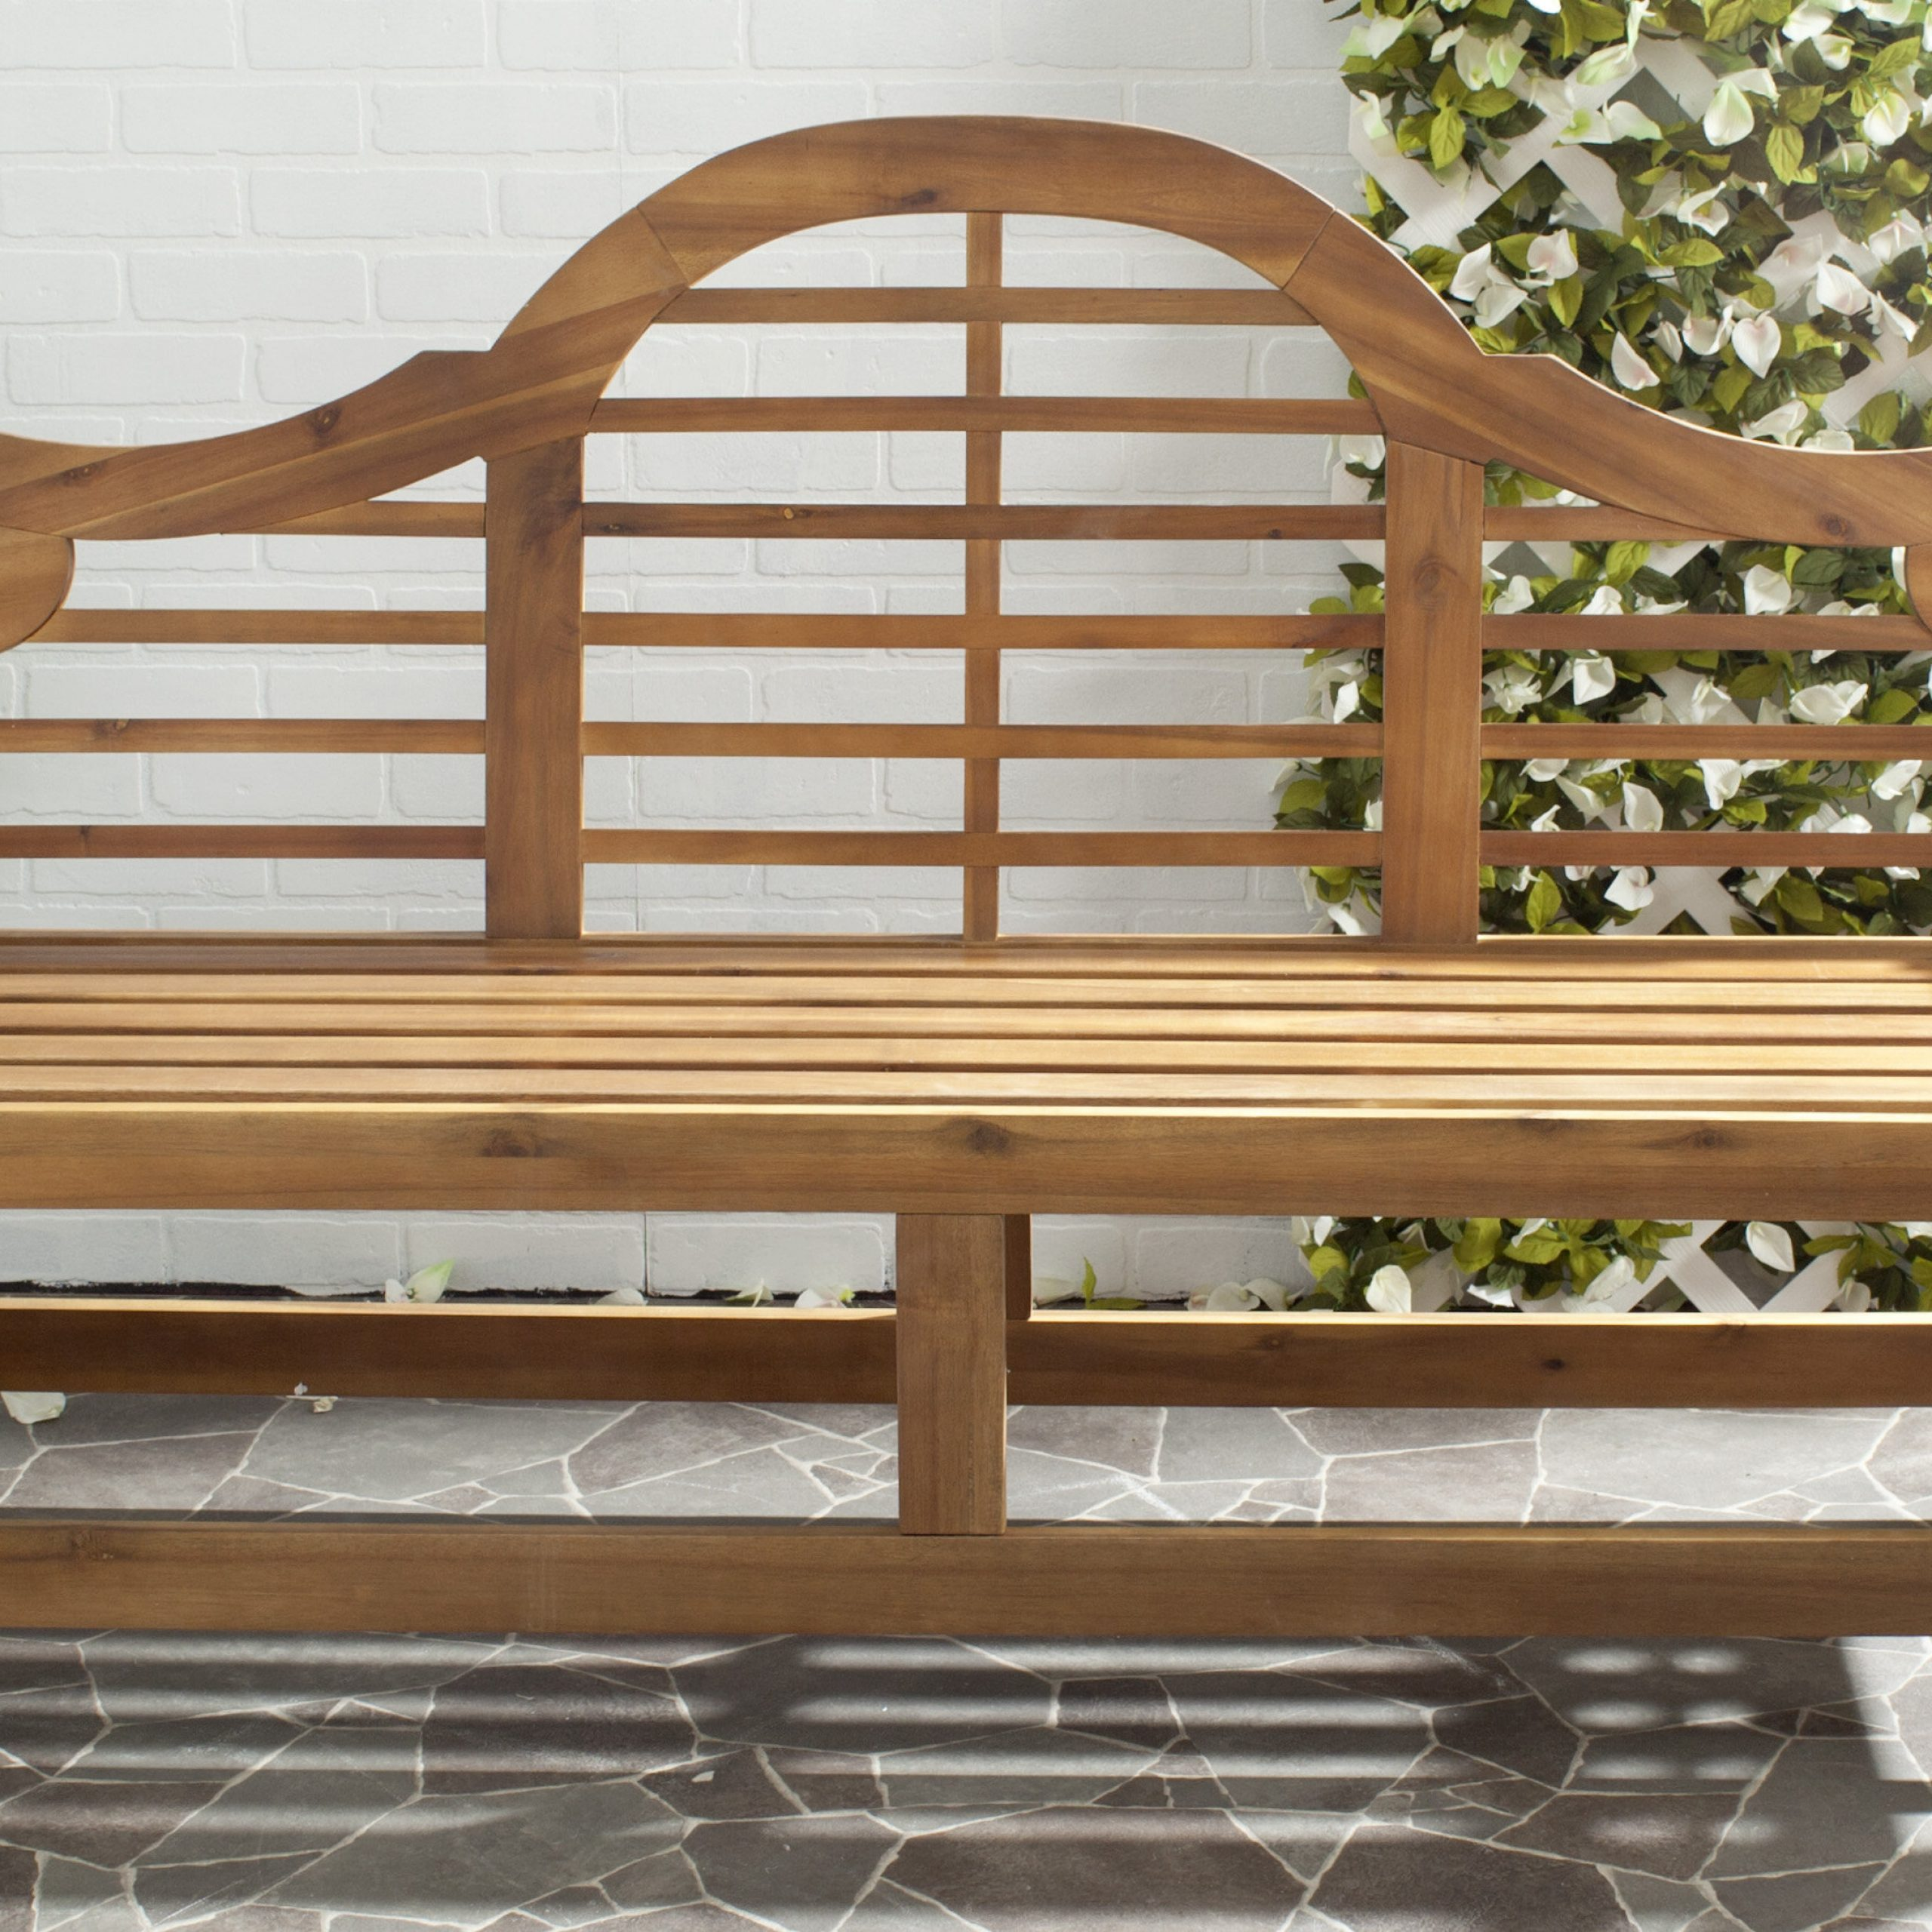 Trendy Lucille Timberland Wooden Garden Benches With Regard To Ruckus Teak Garden Bench (View 8 of 30)